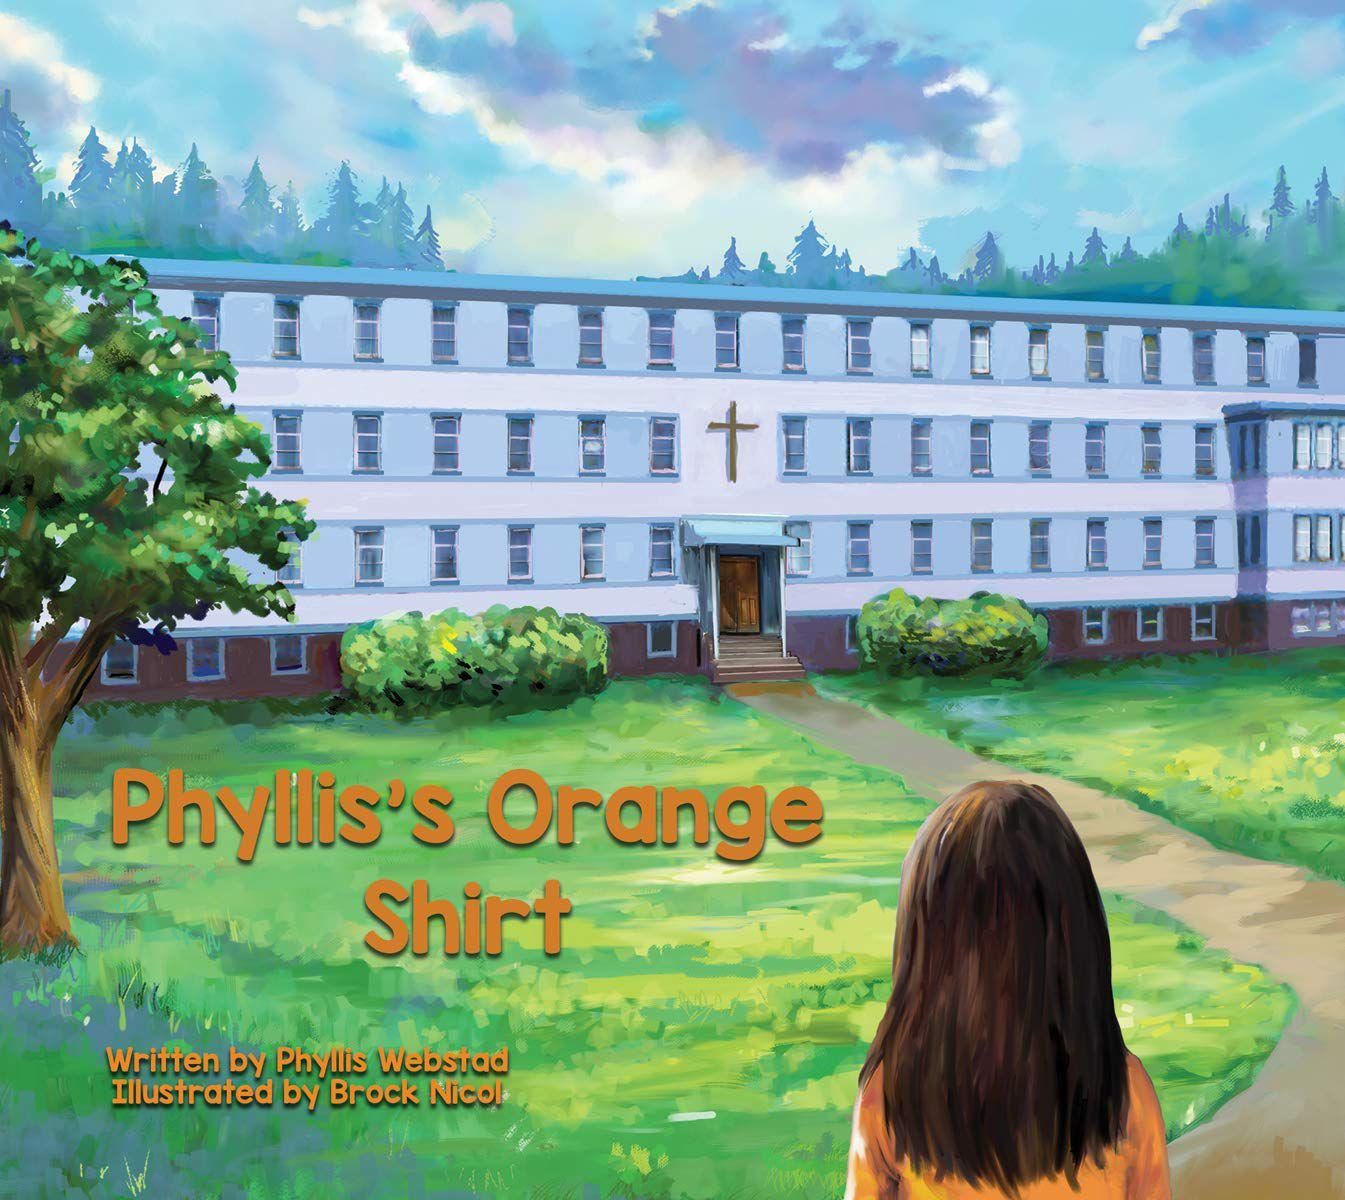 Phyllis's Orange Shirt cover